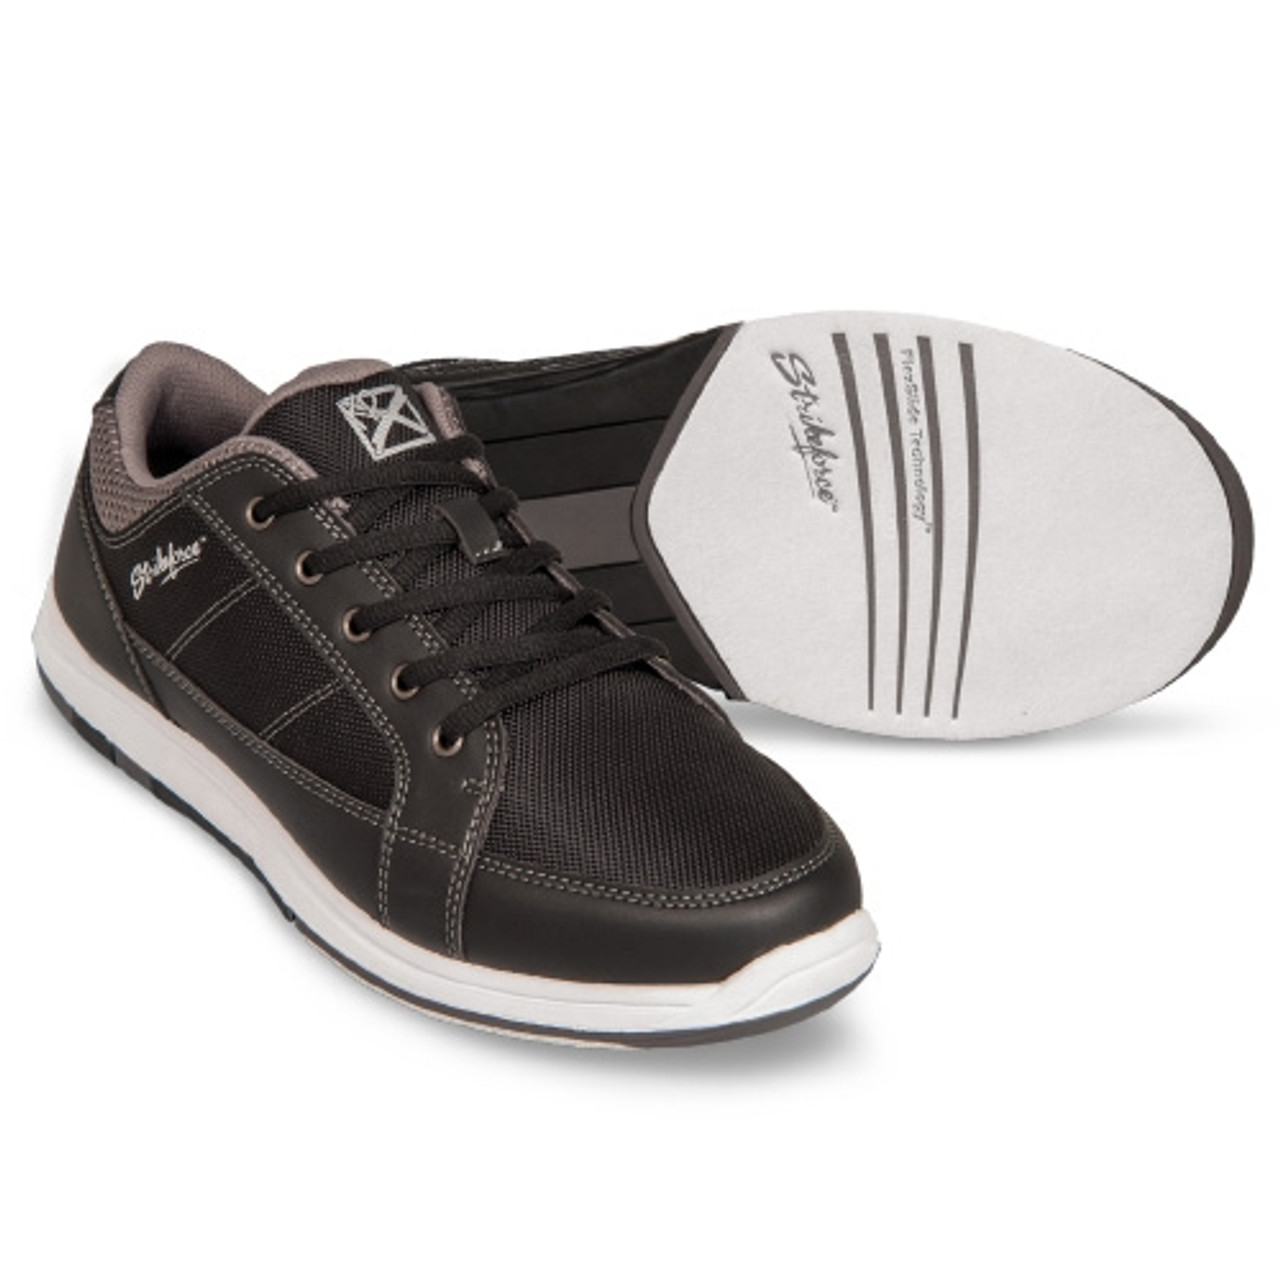 Black//Charcoal KR Strikeforce Mens Spartan Bowling Shoes